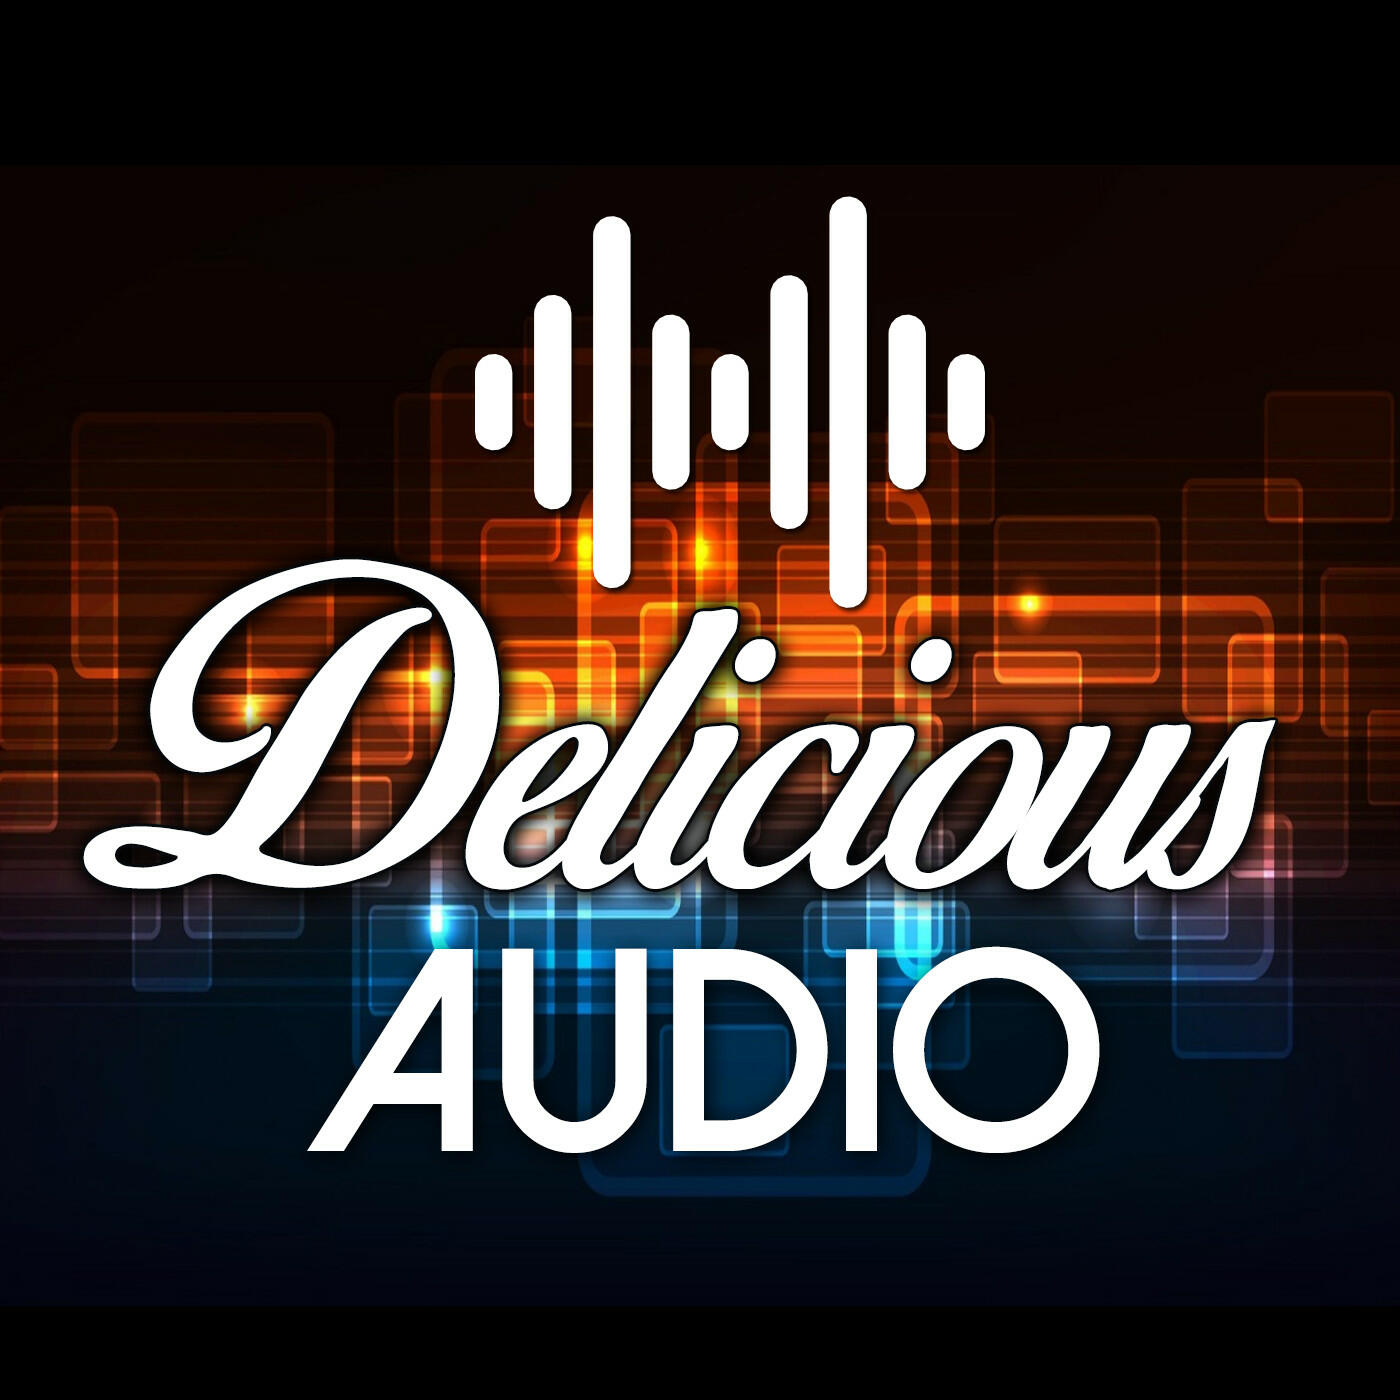 061918 Delicious Audio